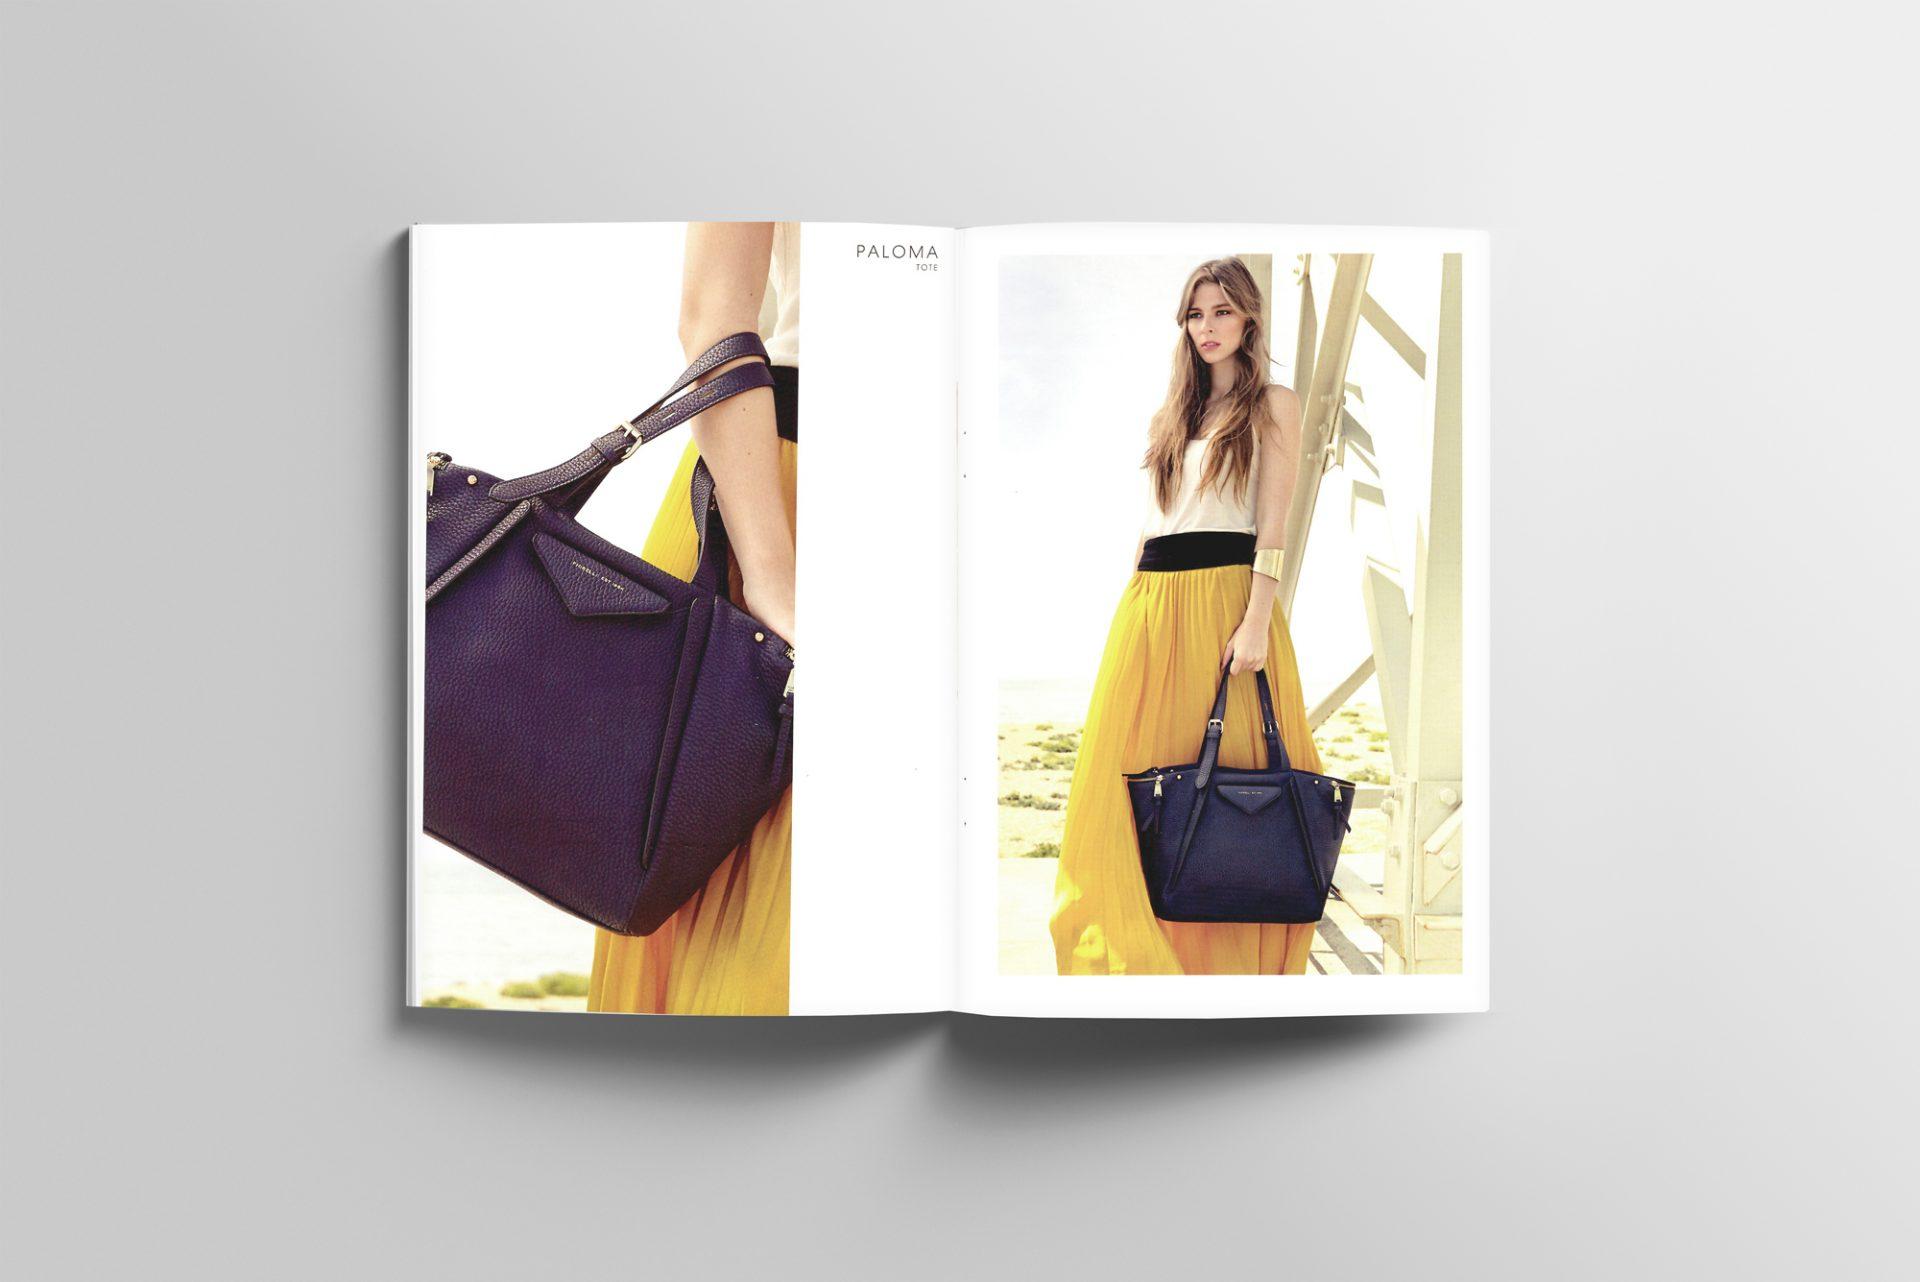 Fiorellii, handbag, Design, print, fashion, designer, press, pr, Heather Create, Heather Hamilton, Heather Hamilton Saunders,